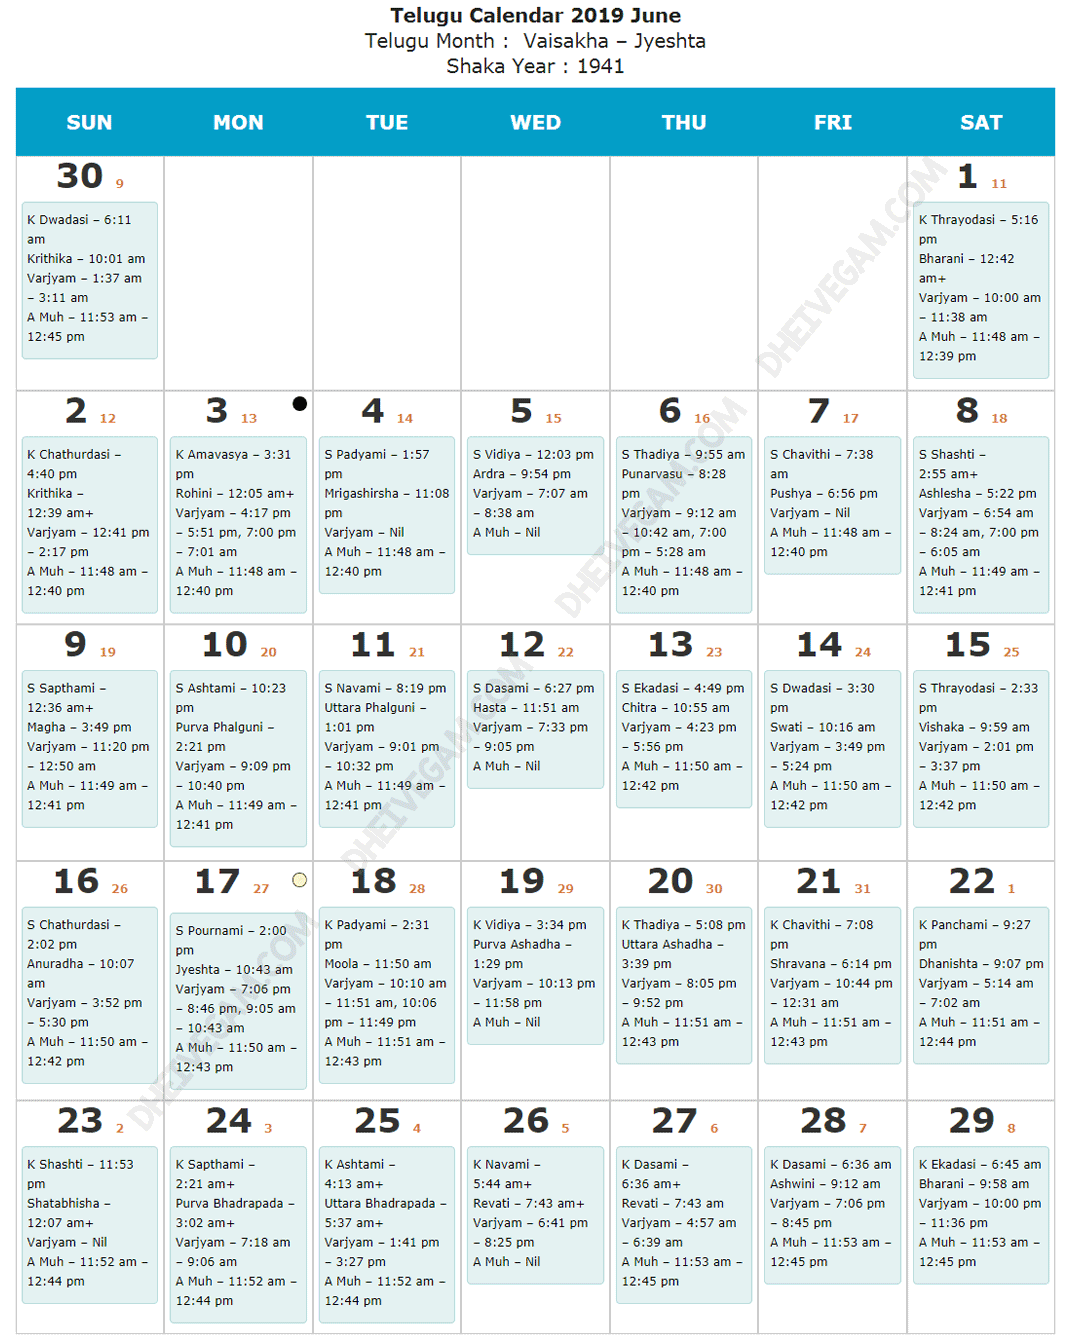 June 2019 Telugu calendar